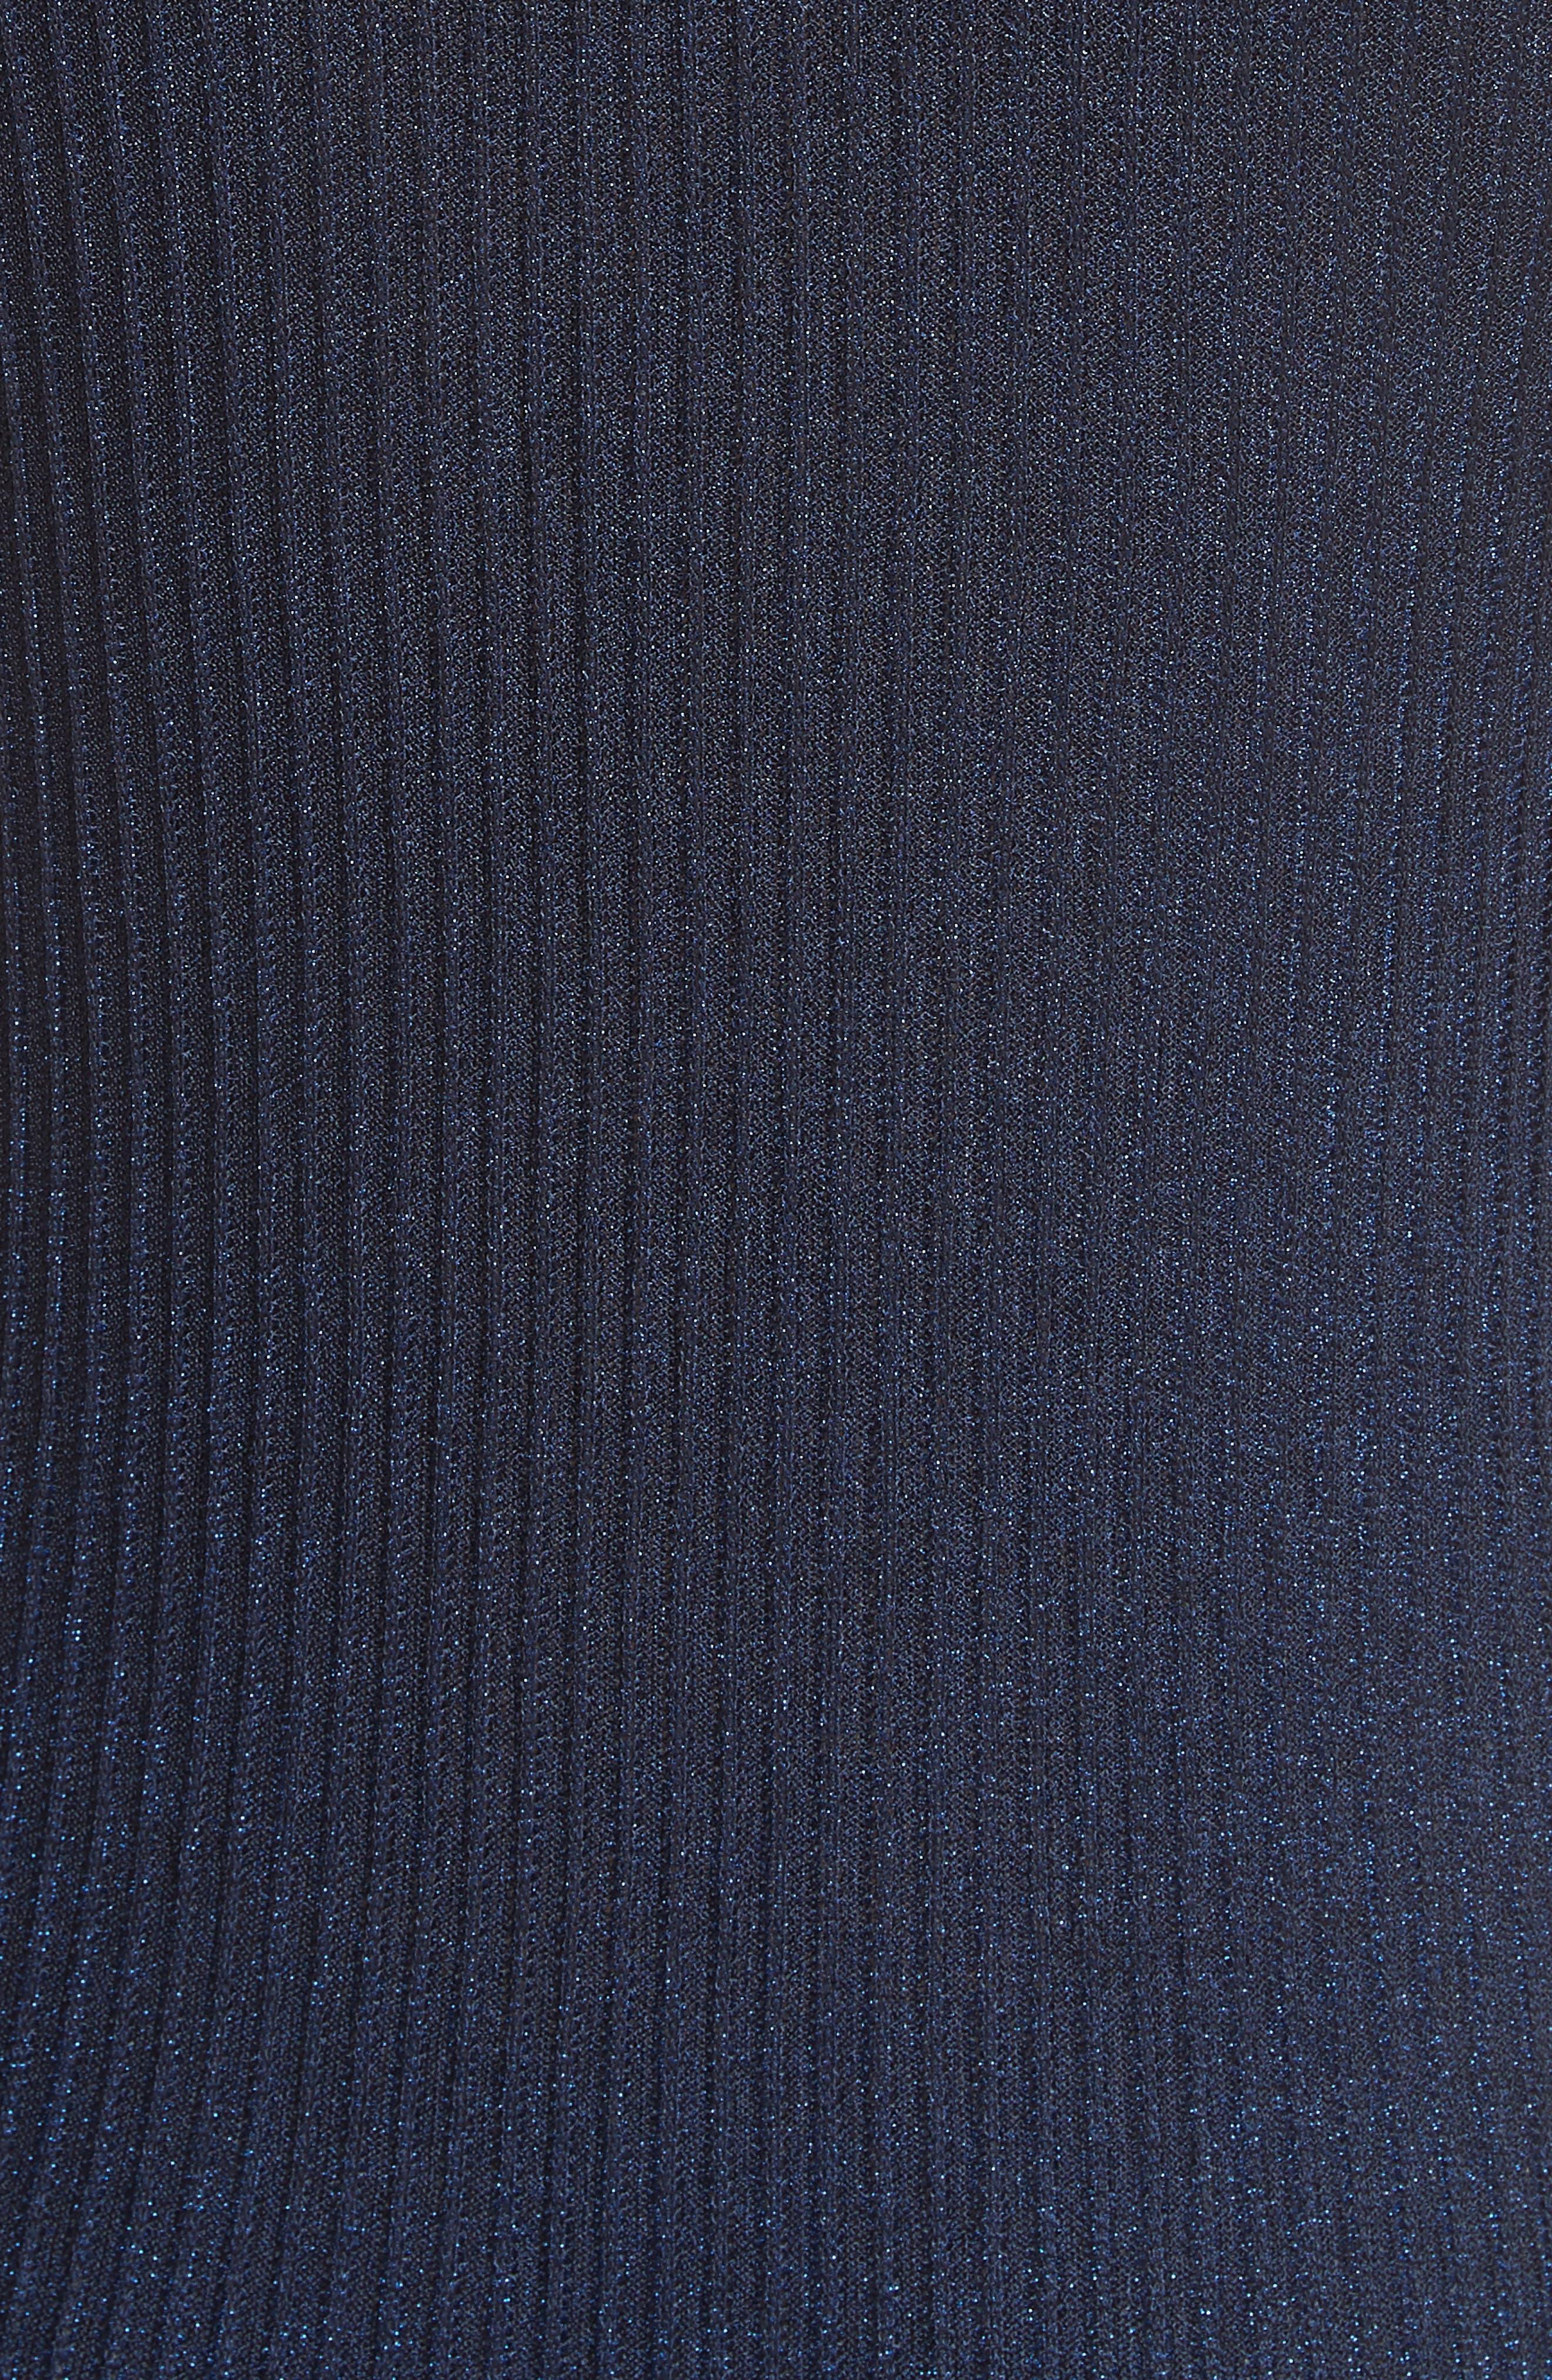 Cora Ribbed Dress,                             Alternate thumbnail 5, color,                             NAVY/ BLUE